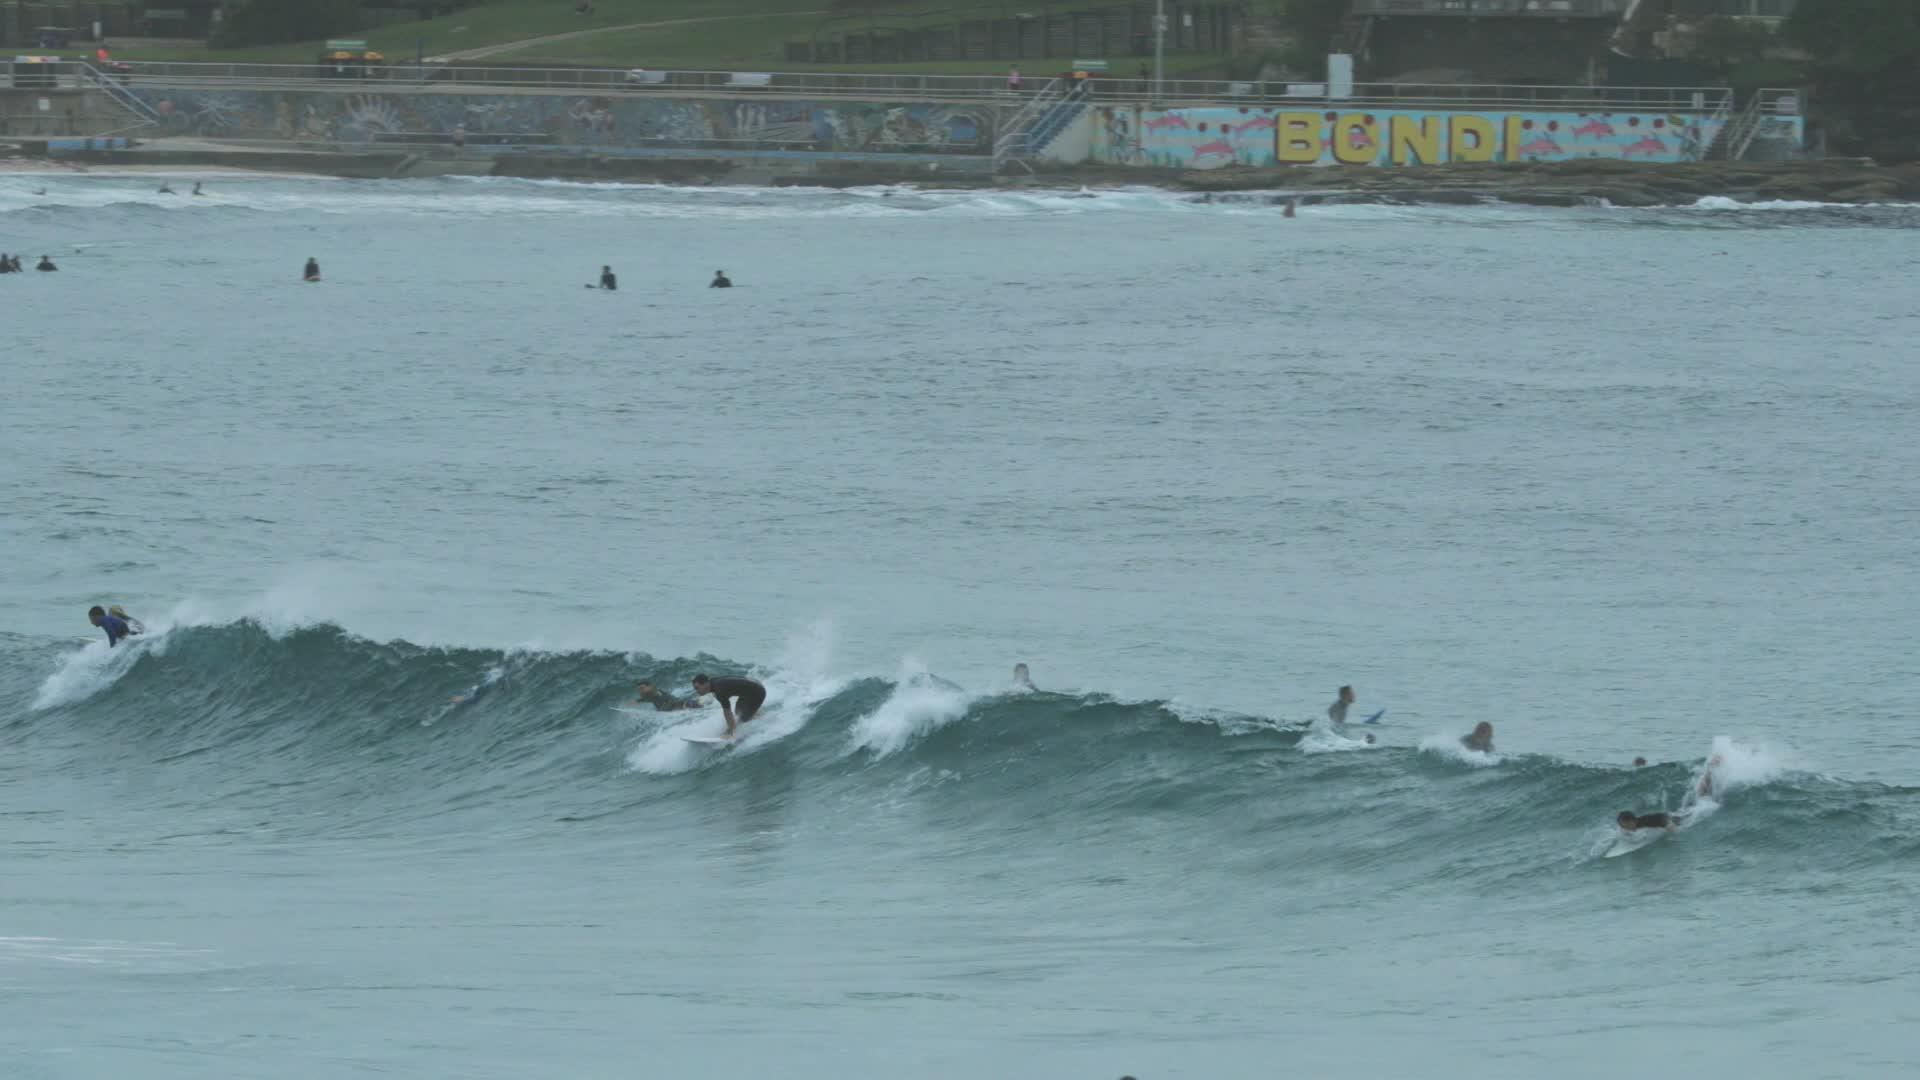 fail, slow motion, surfing, Surfing Bondi face plant GIFs